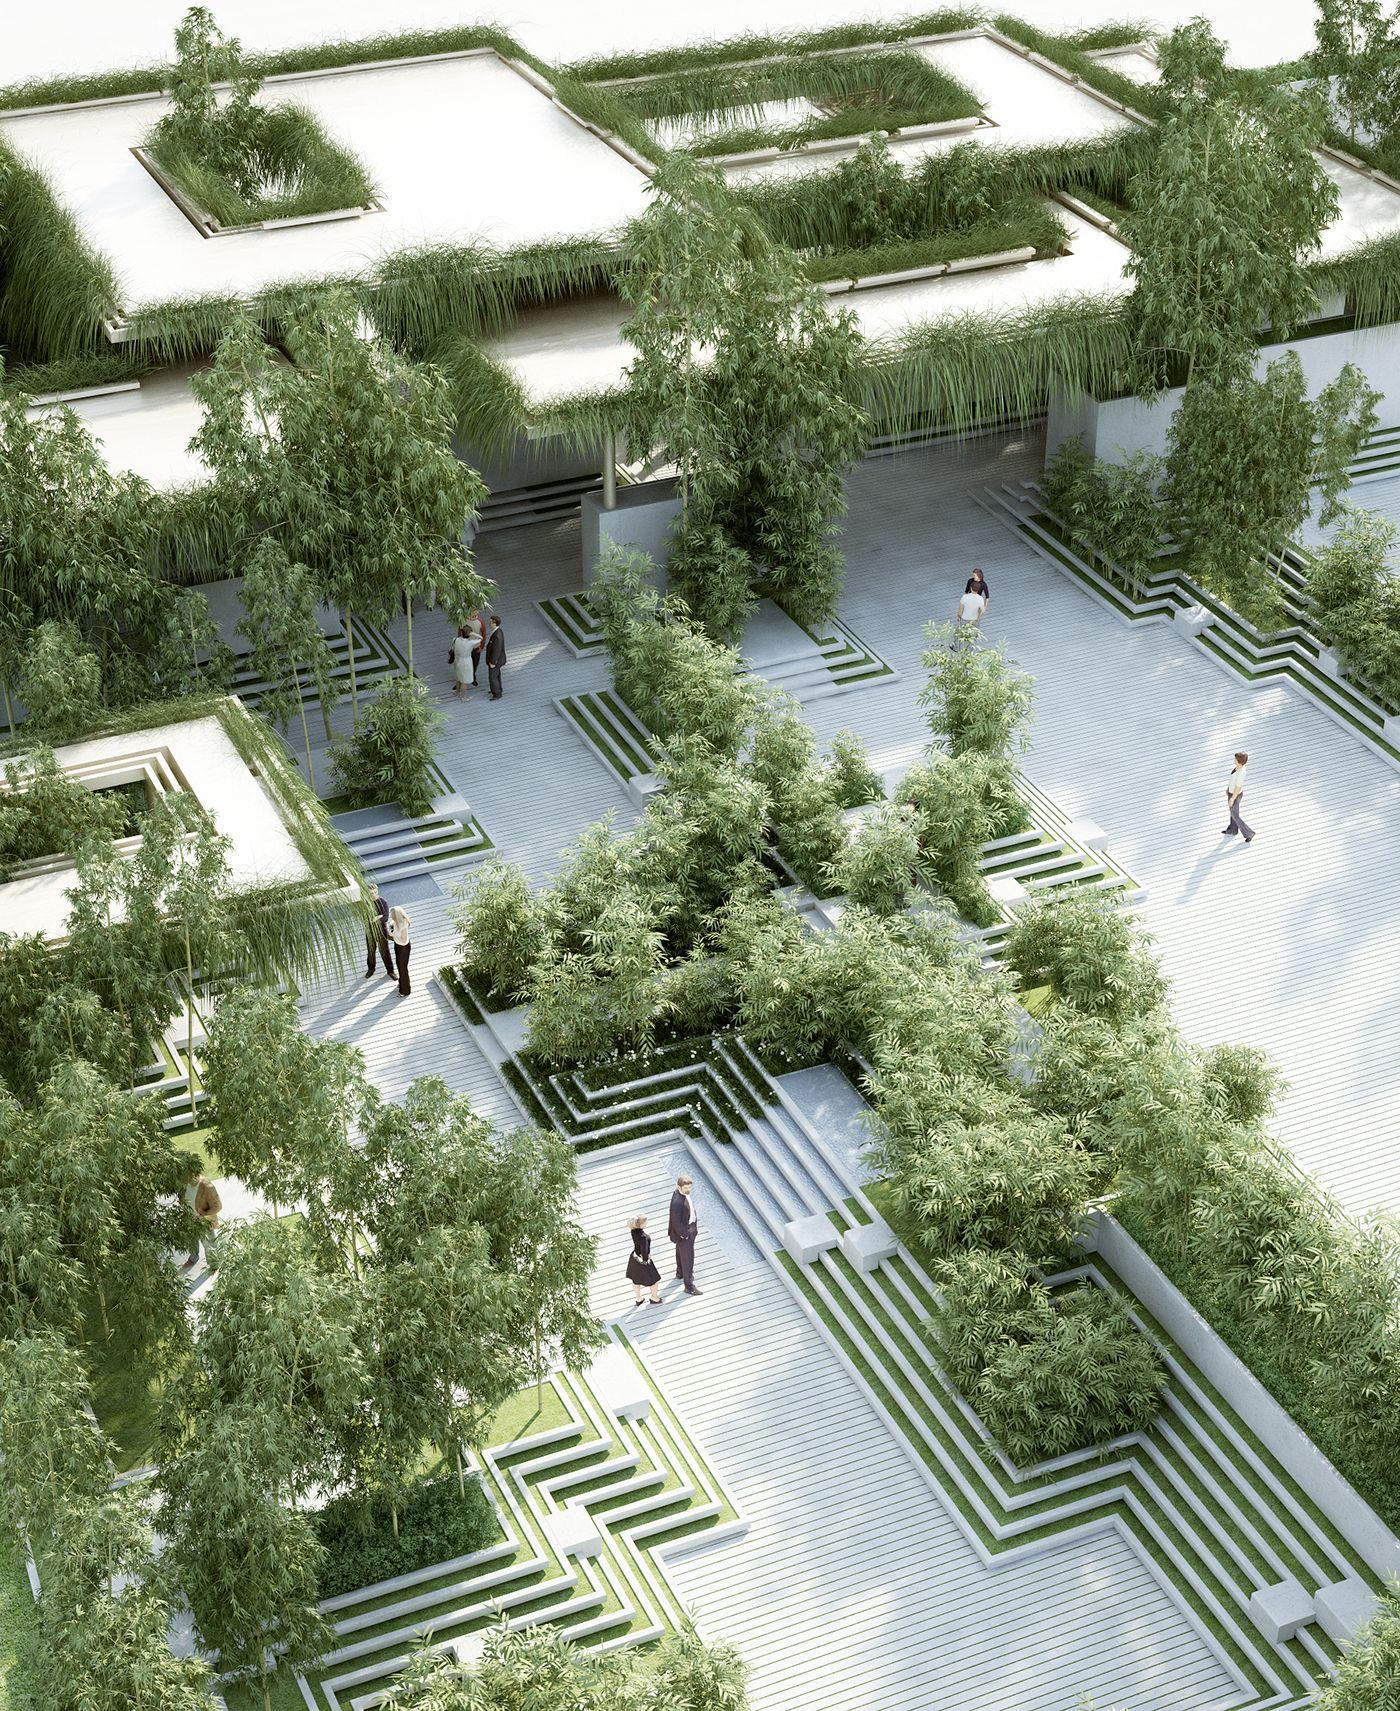 The project describes a landscape design and facade design for a ...